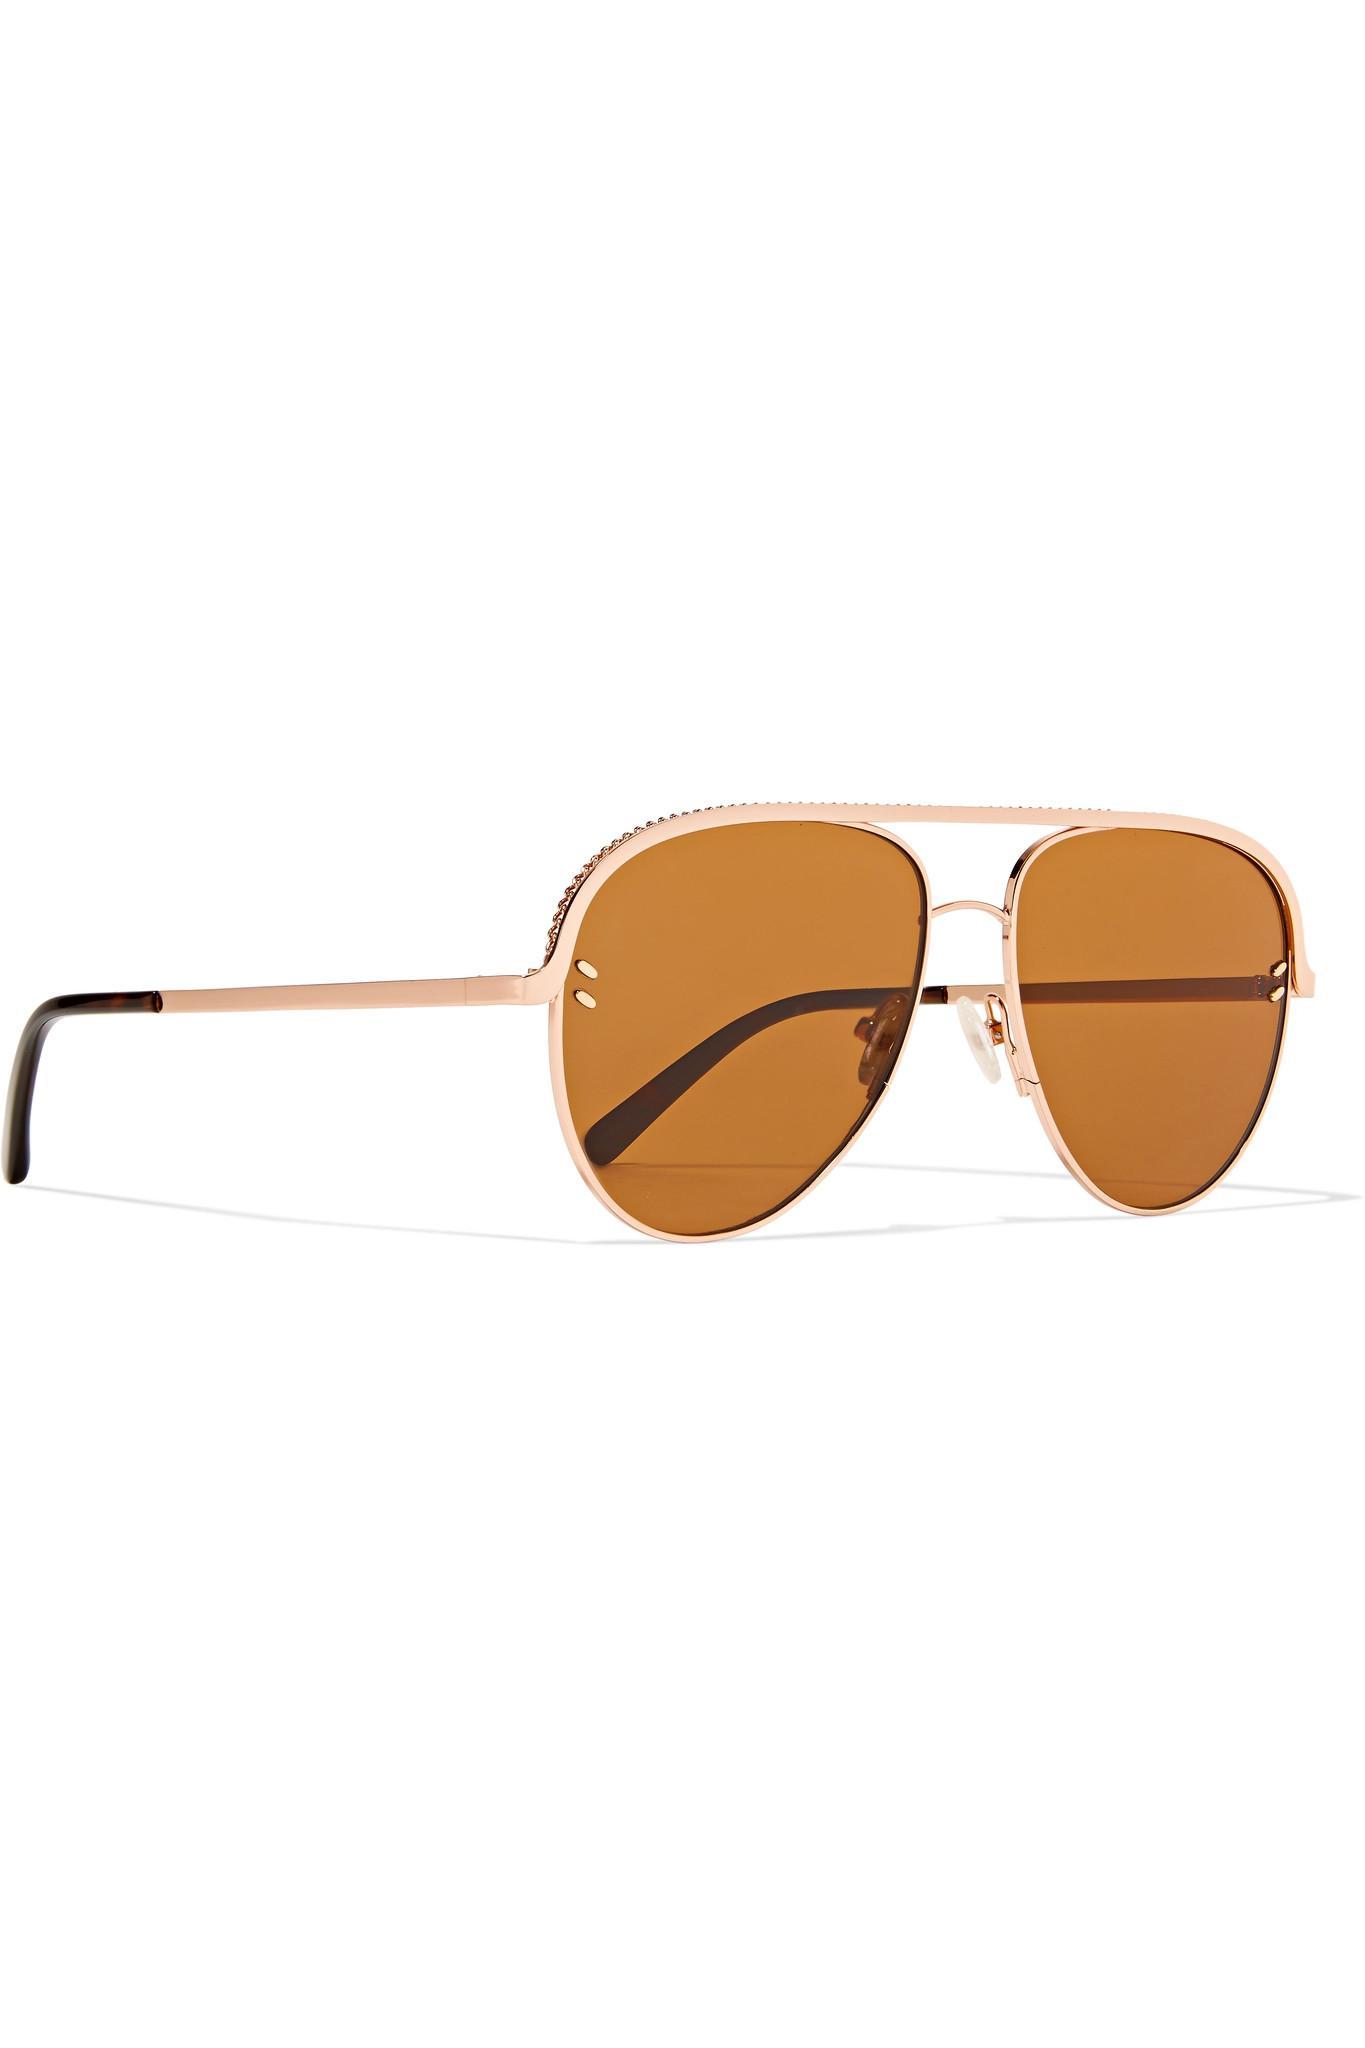 253d2a4ae9c7 Stella McCartney - Pink Aviator-style Rose-gold-tone And Acetate Sunglasses  -. View fullscreen